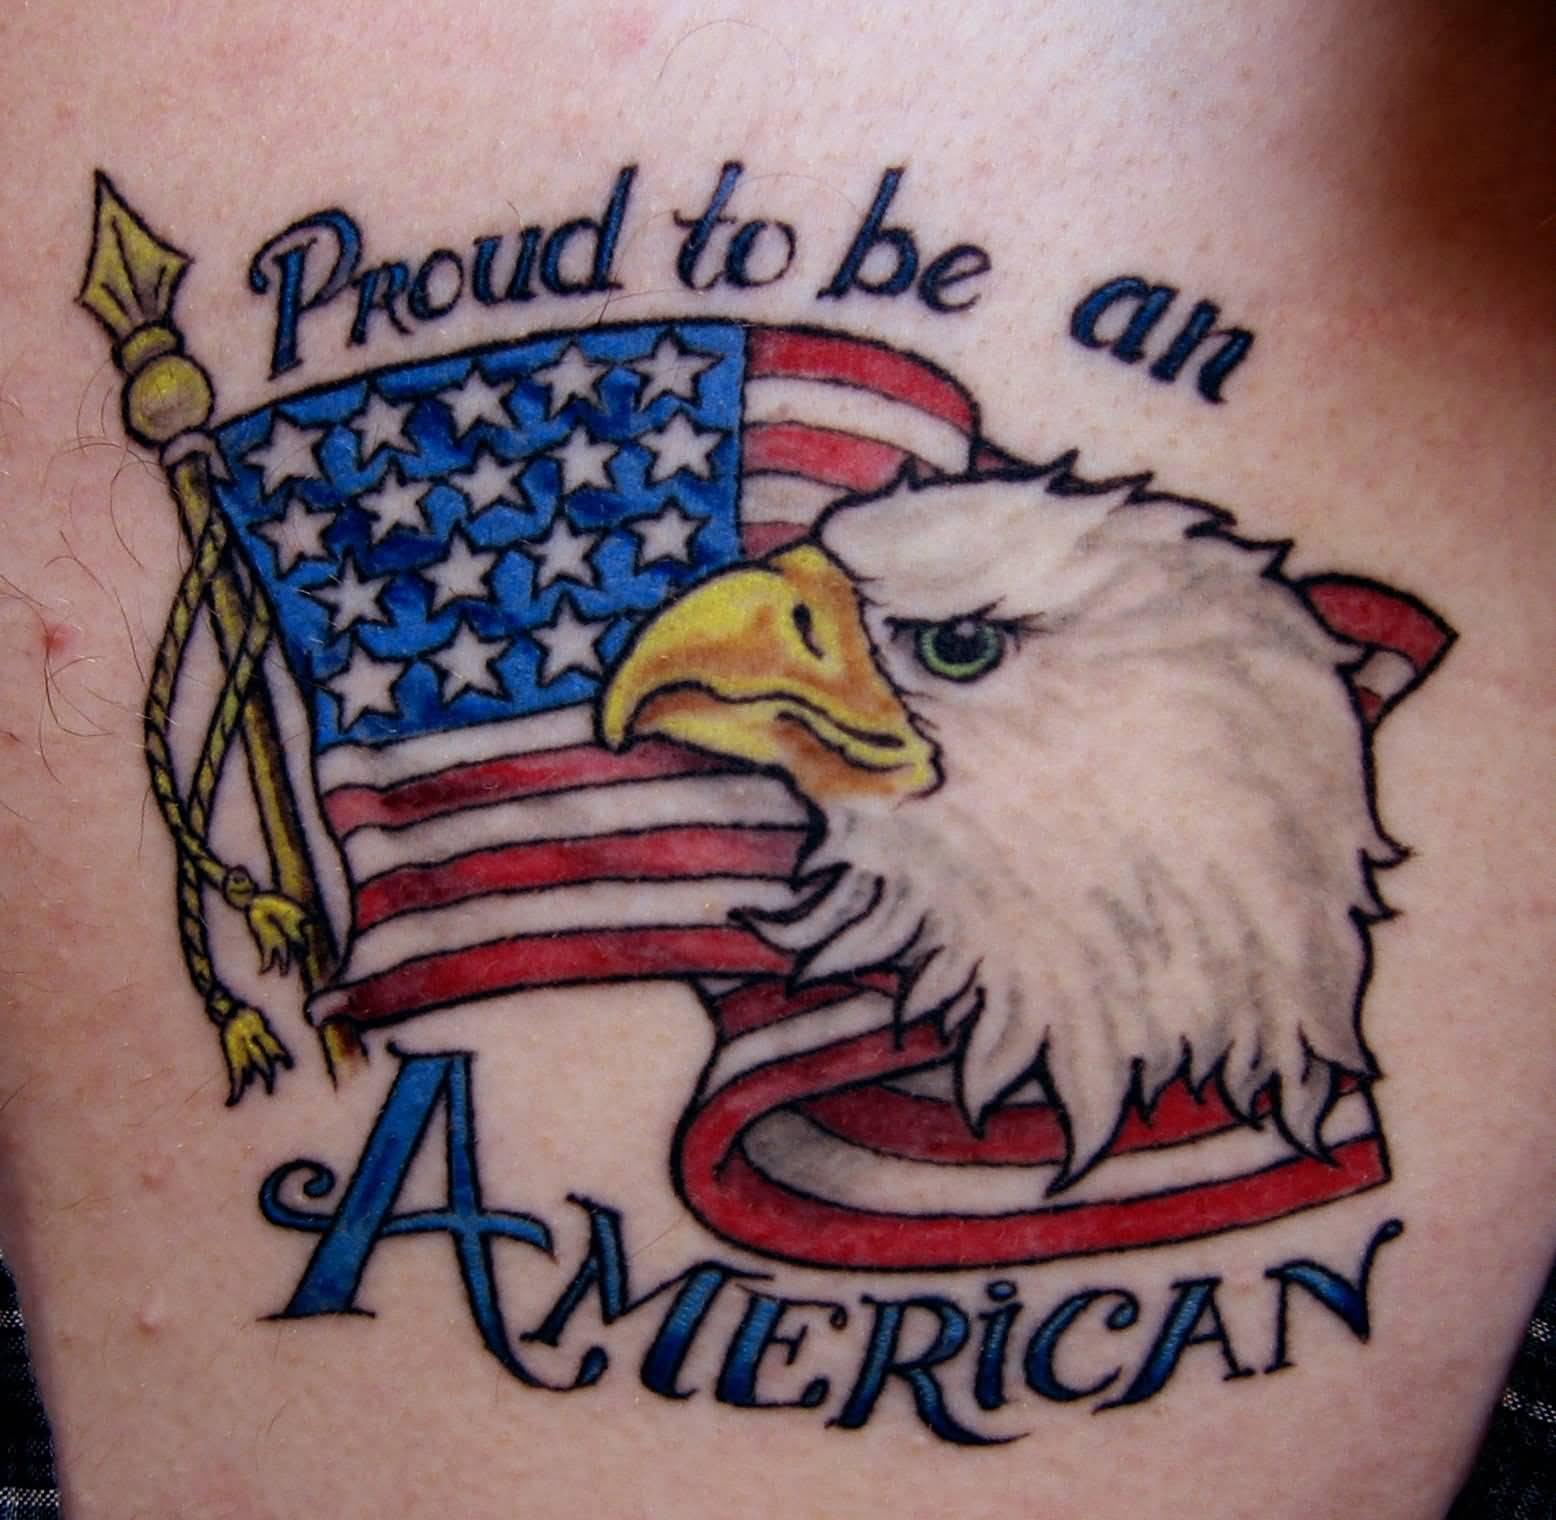 Tattoo Designs Usa: 50+ Patriotic Tattoos Ideas